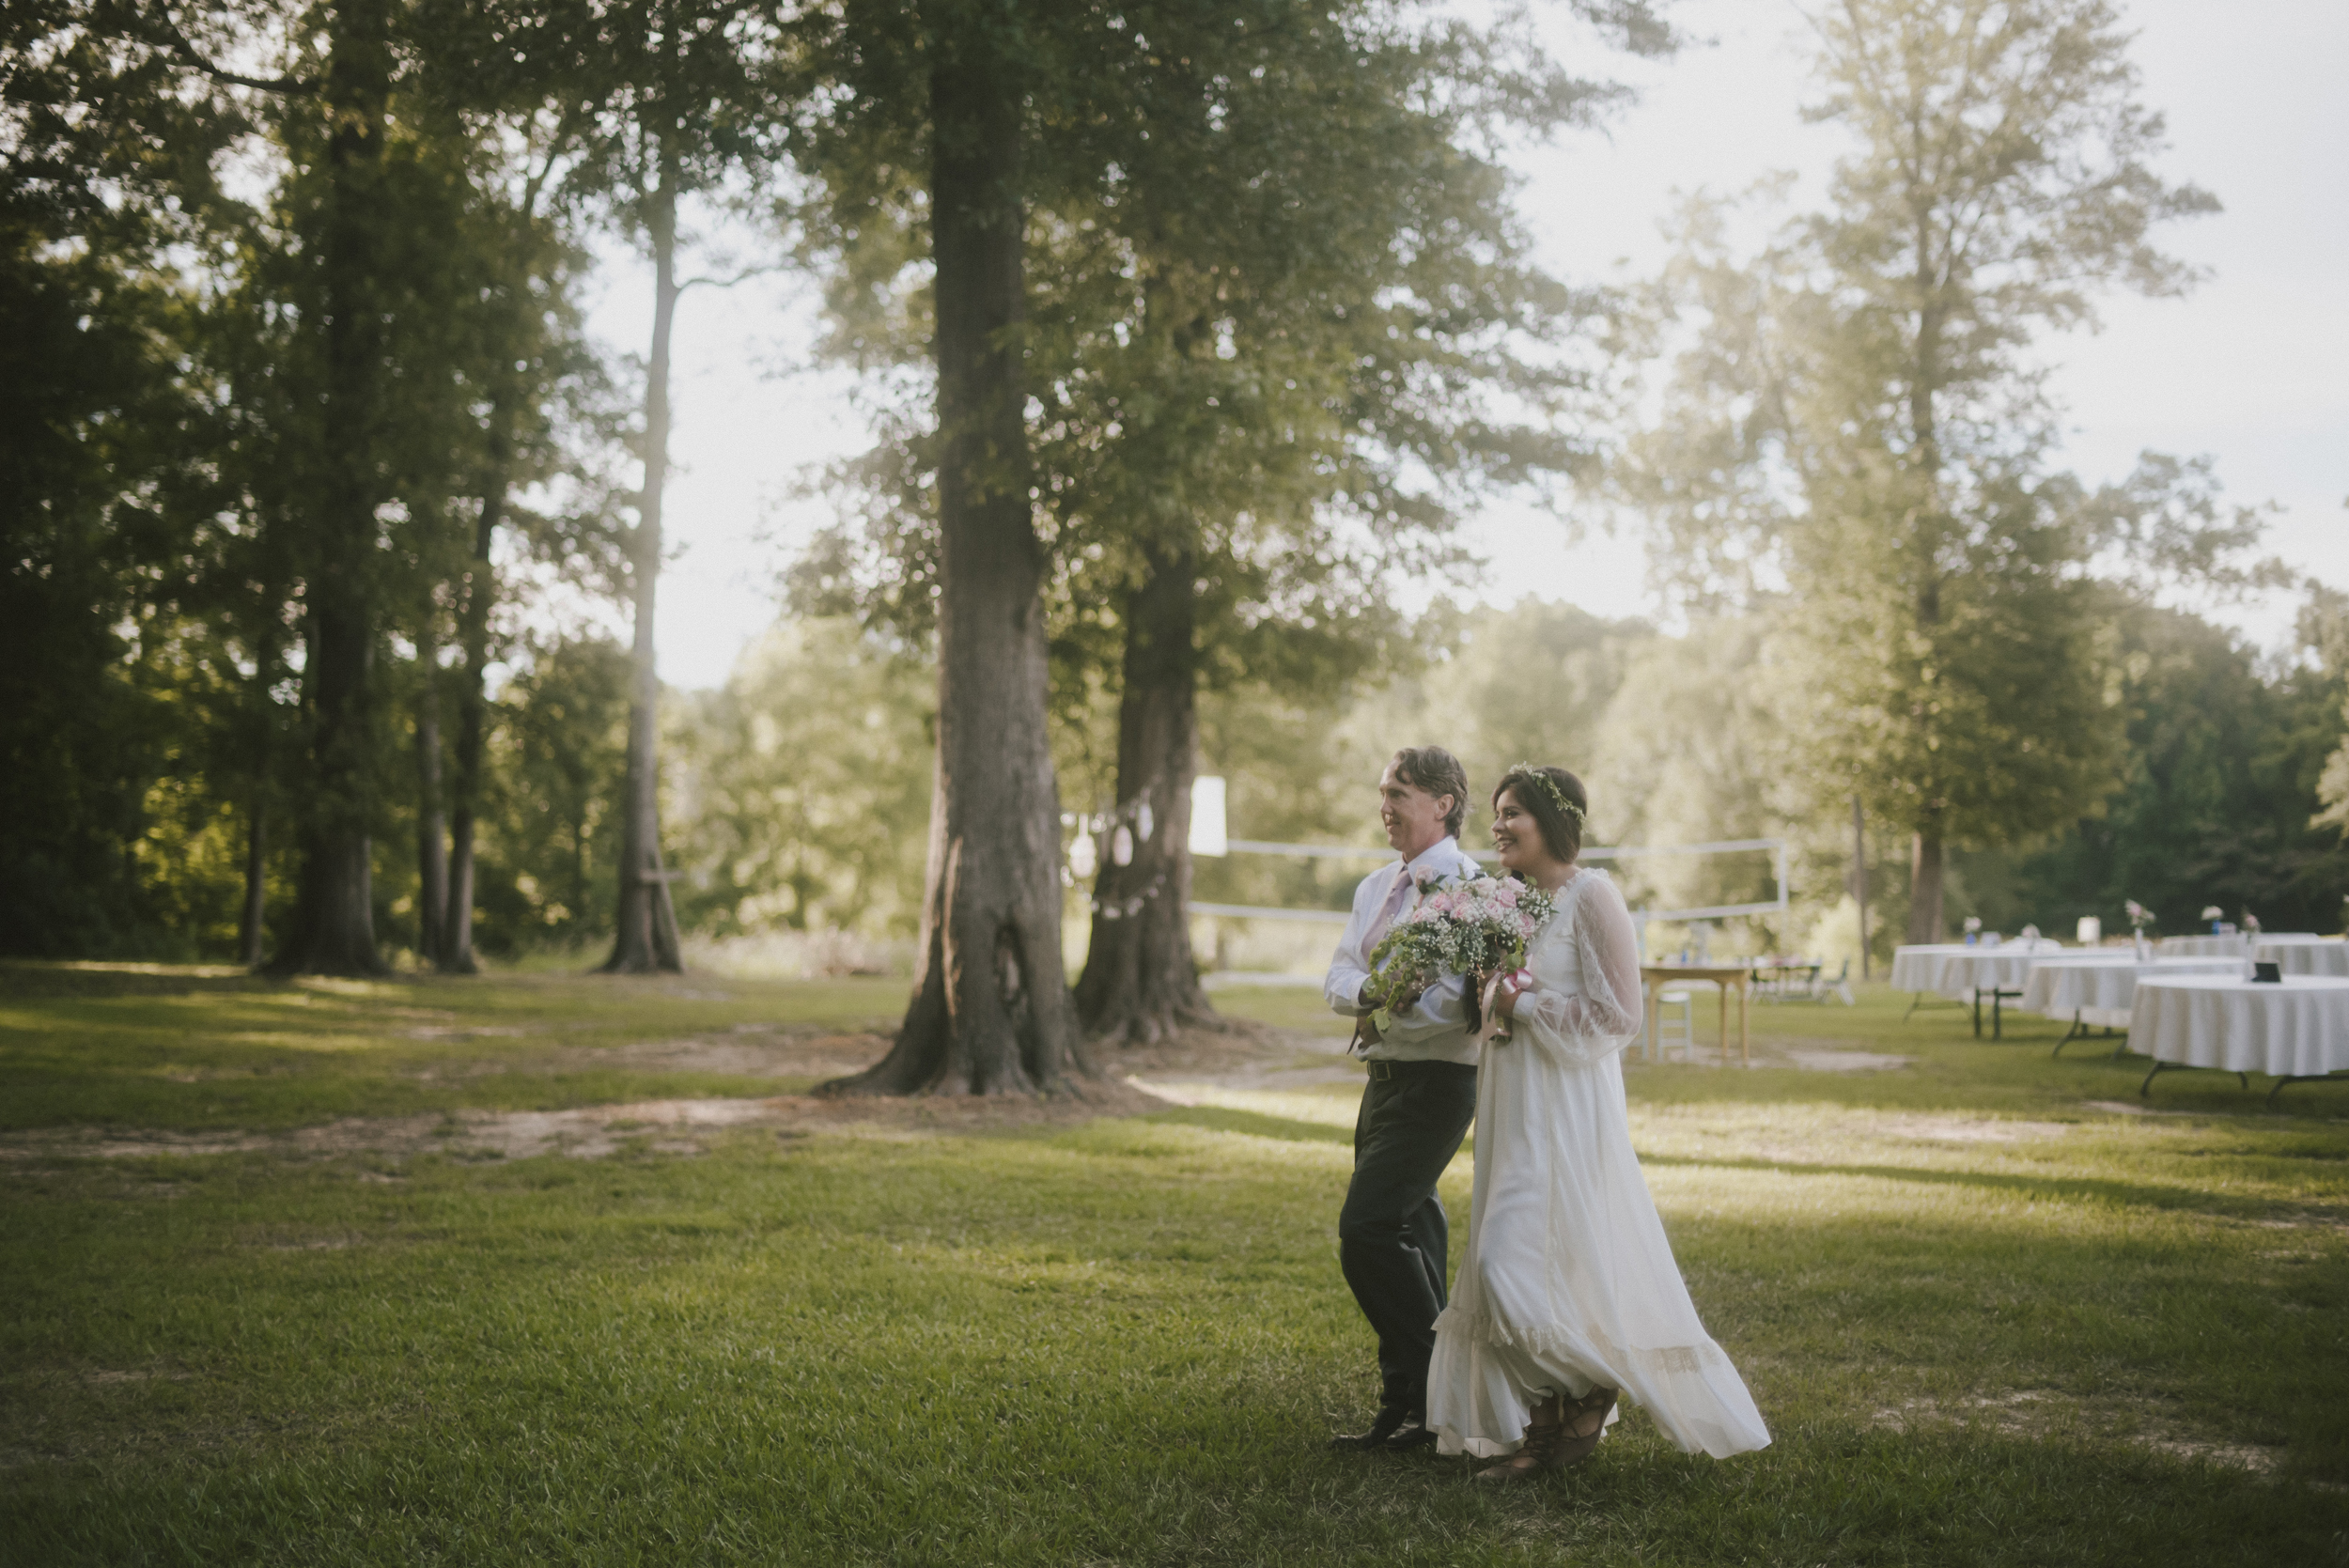 ofRen_weddingphotographer-125.jpg